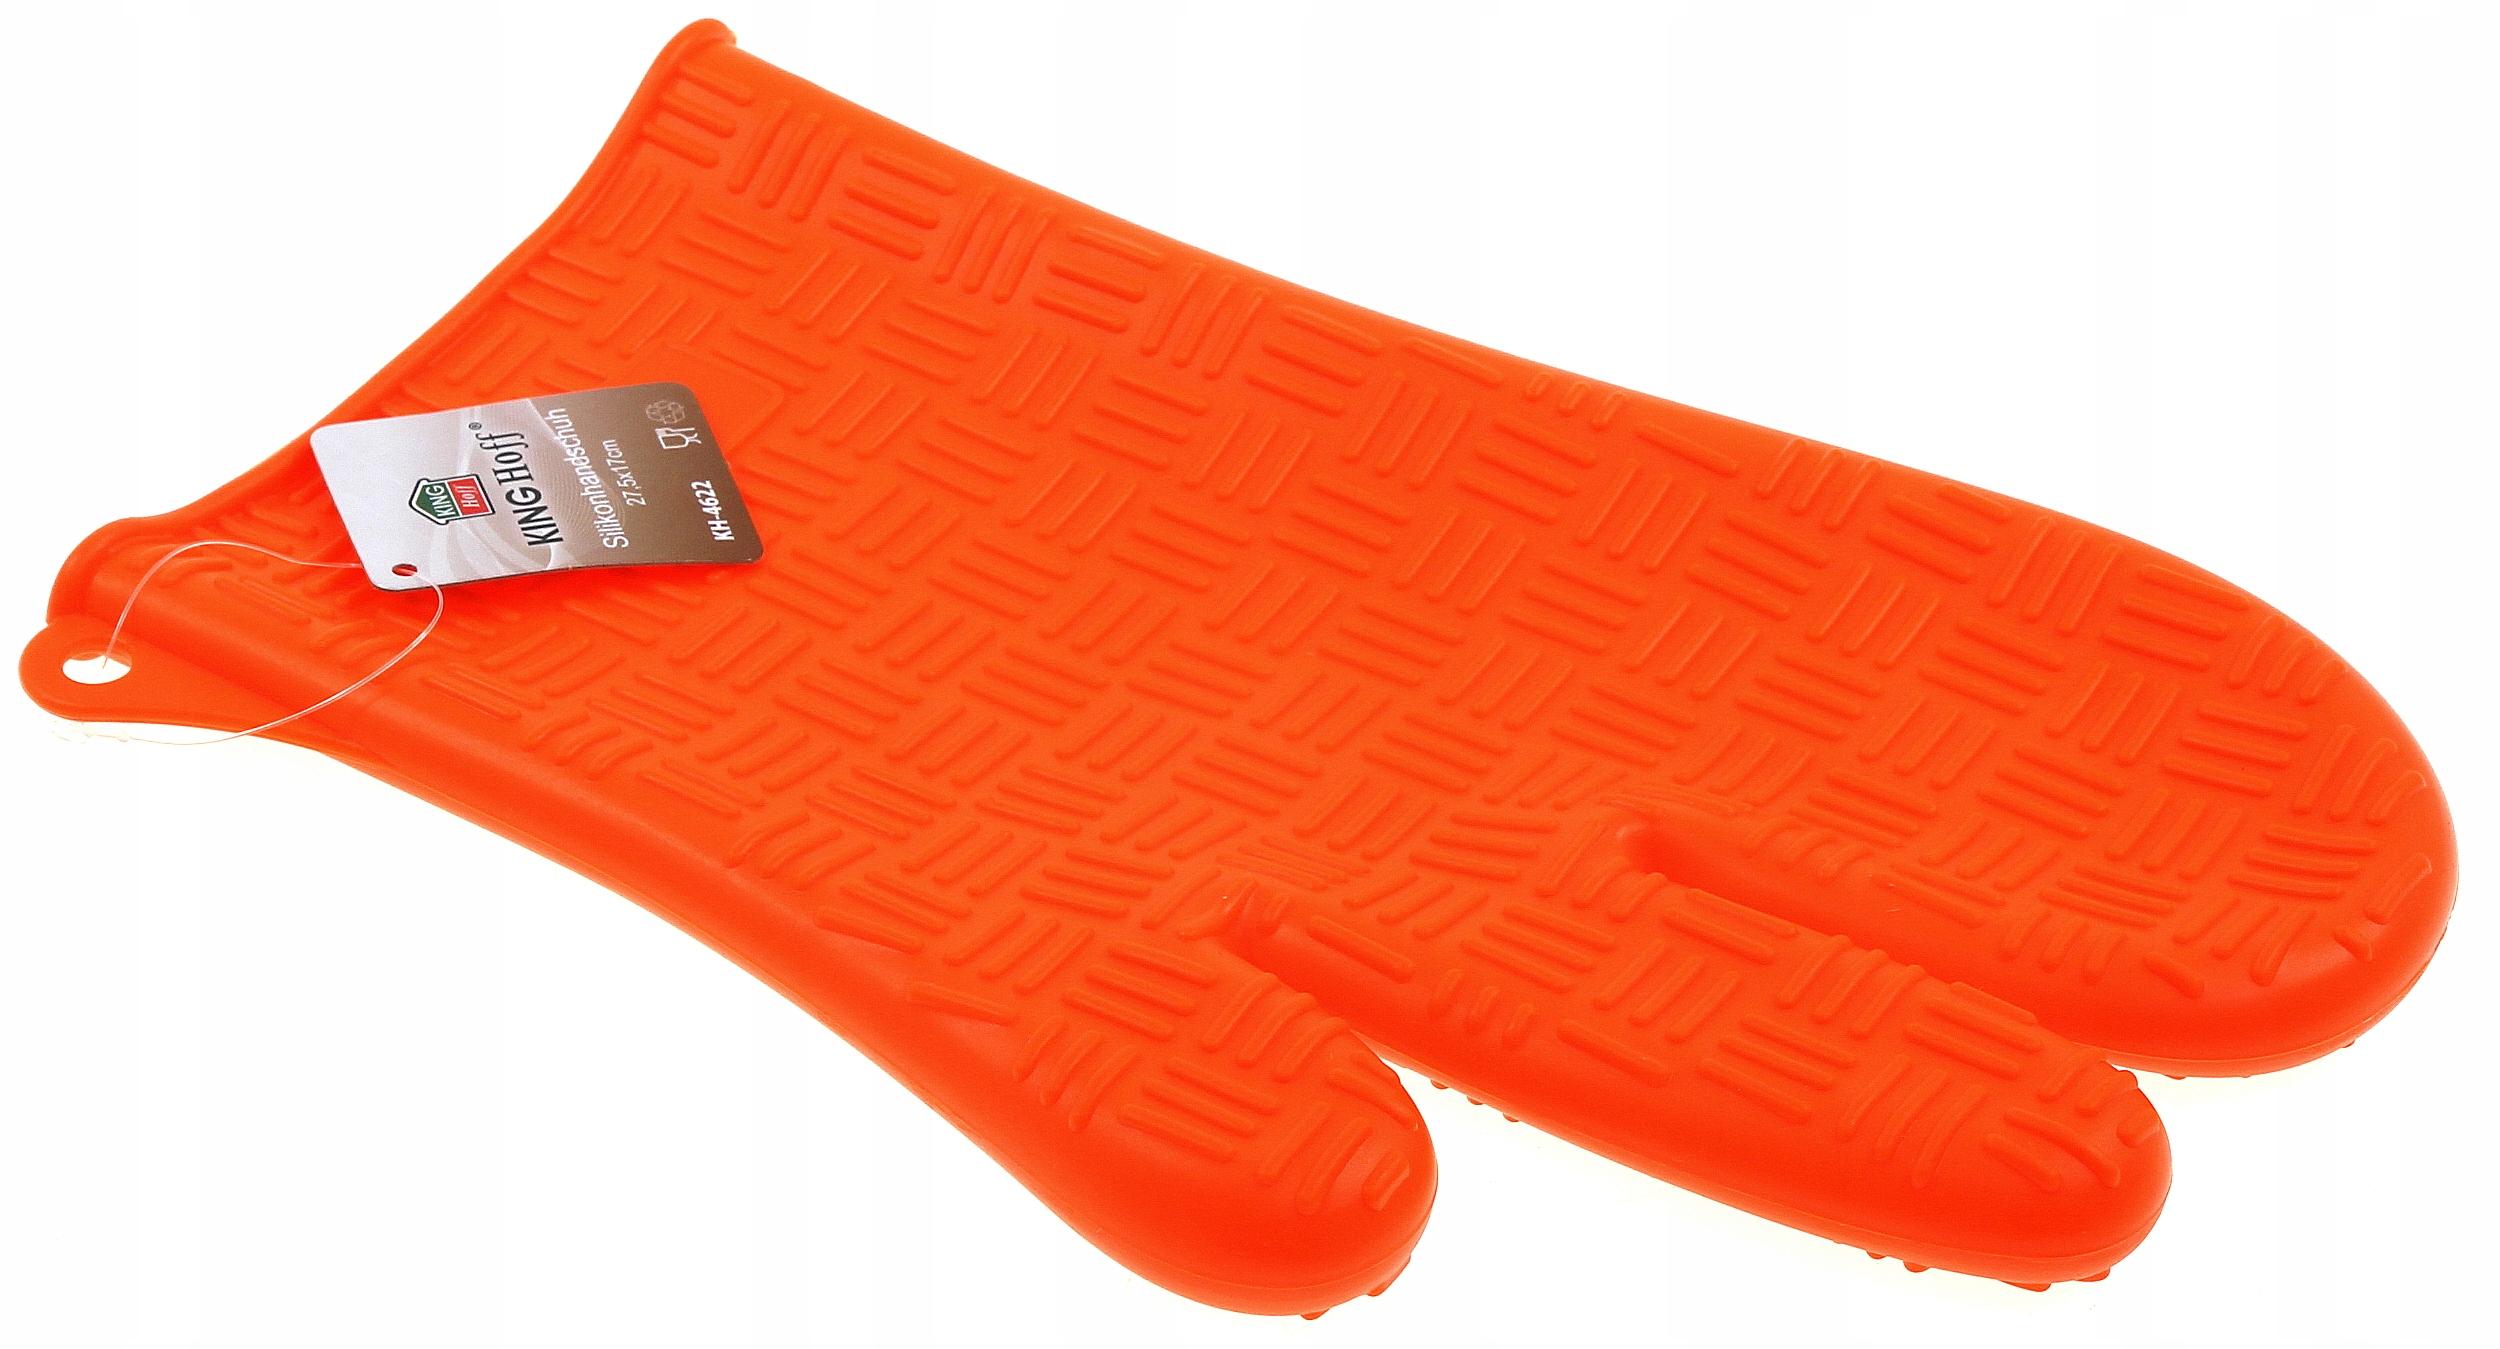 Универсальная кухонная перчатка SILICONE 4622